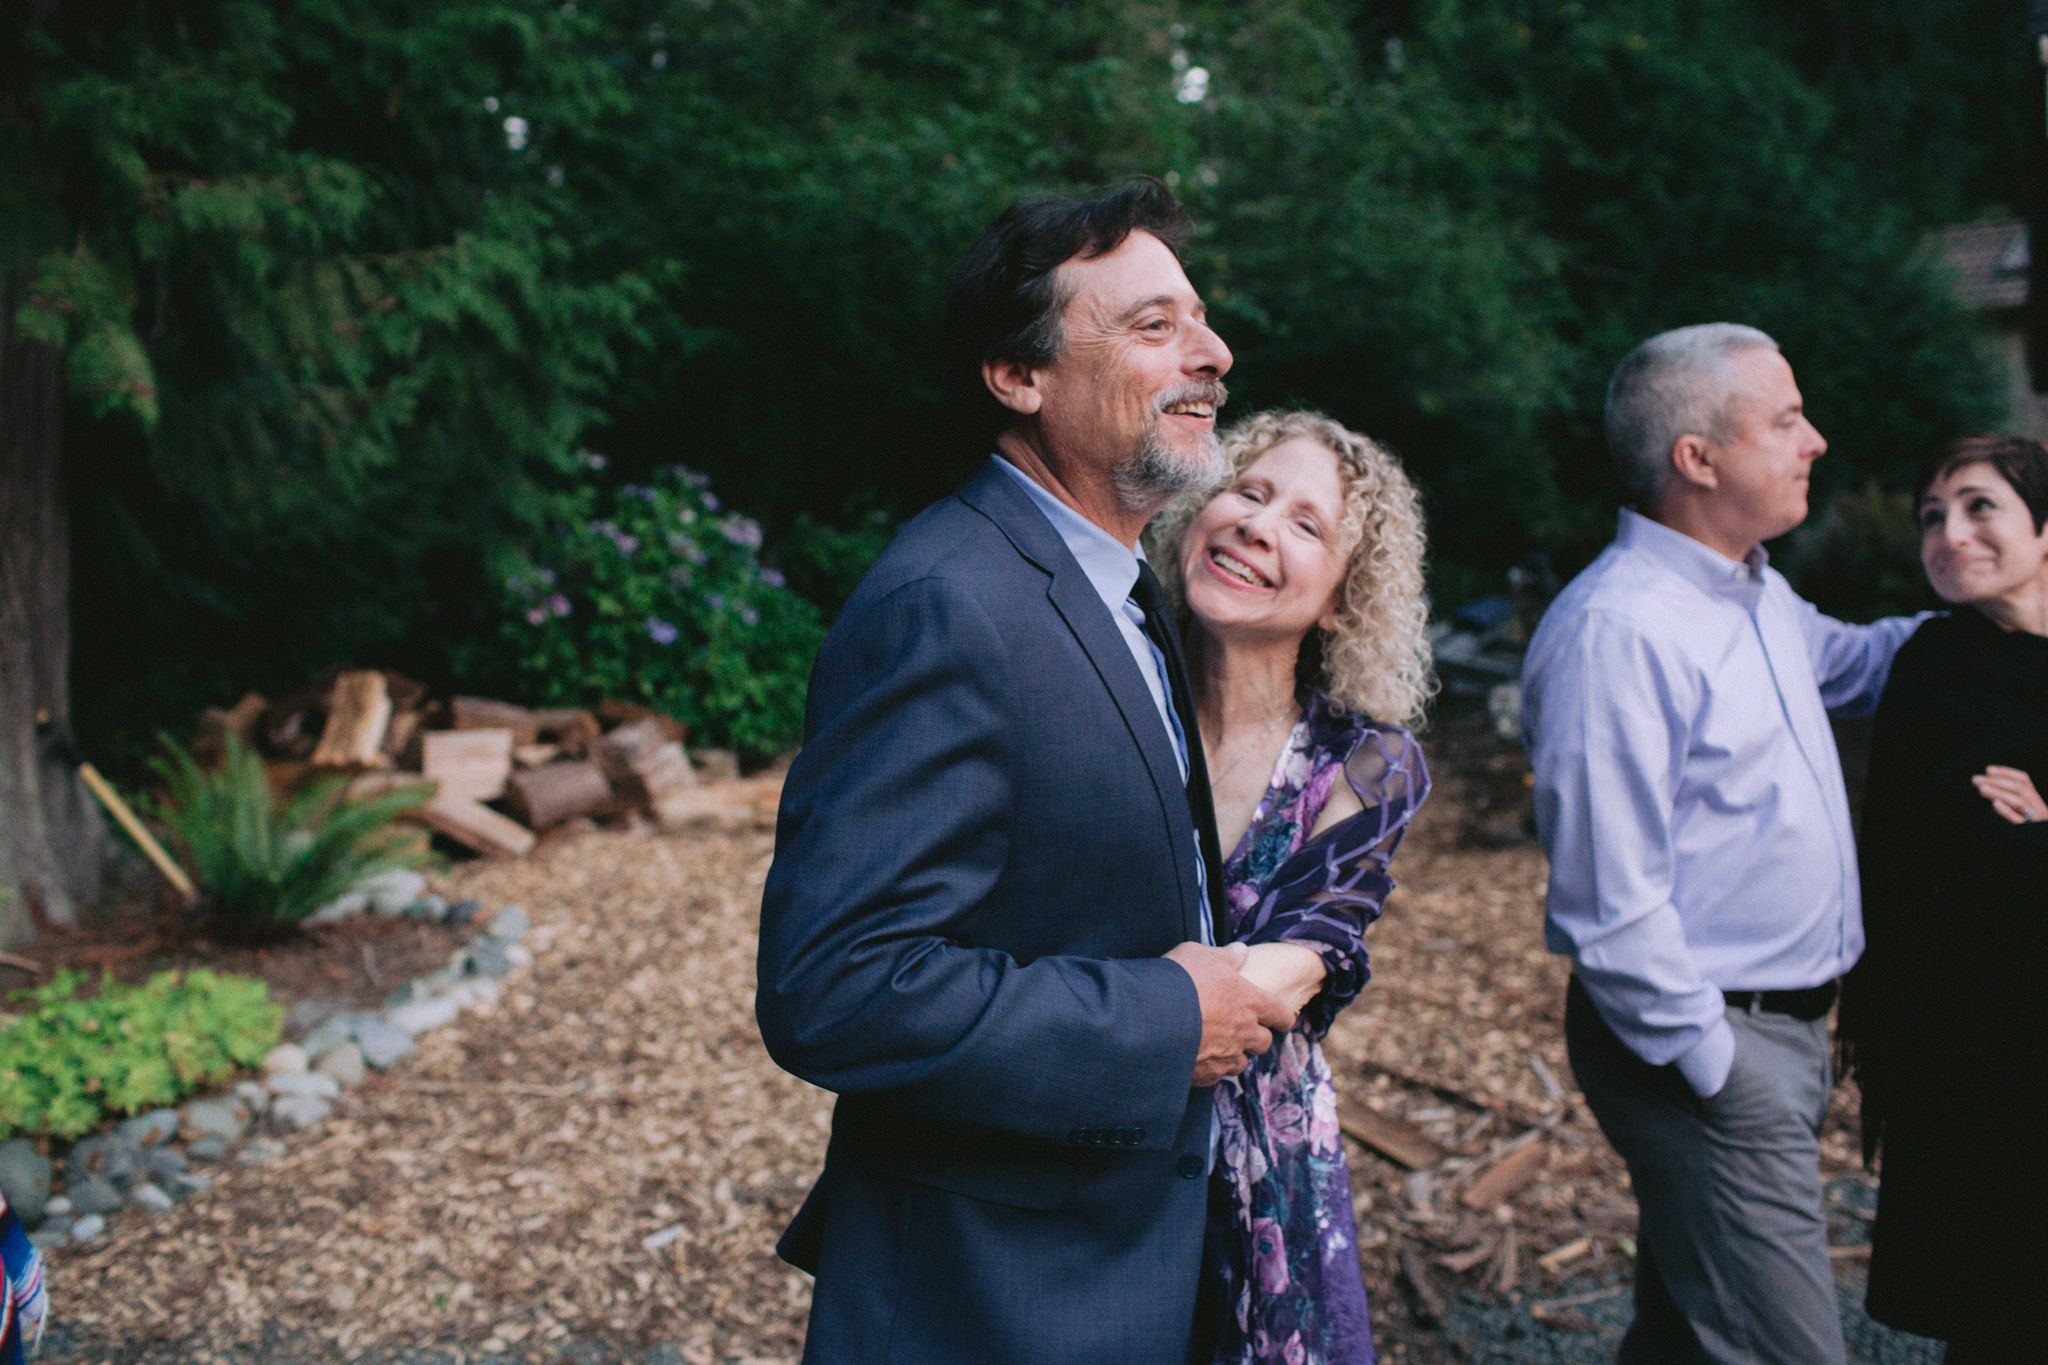 Backyard-Bainbridge-Island-Wedding-Alycia-Lovell-Photography-223.JPG